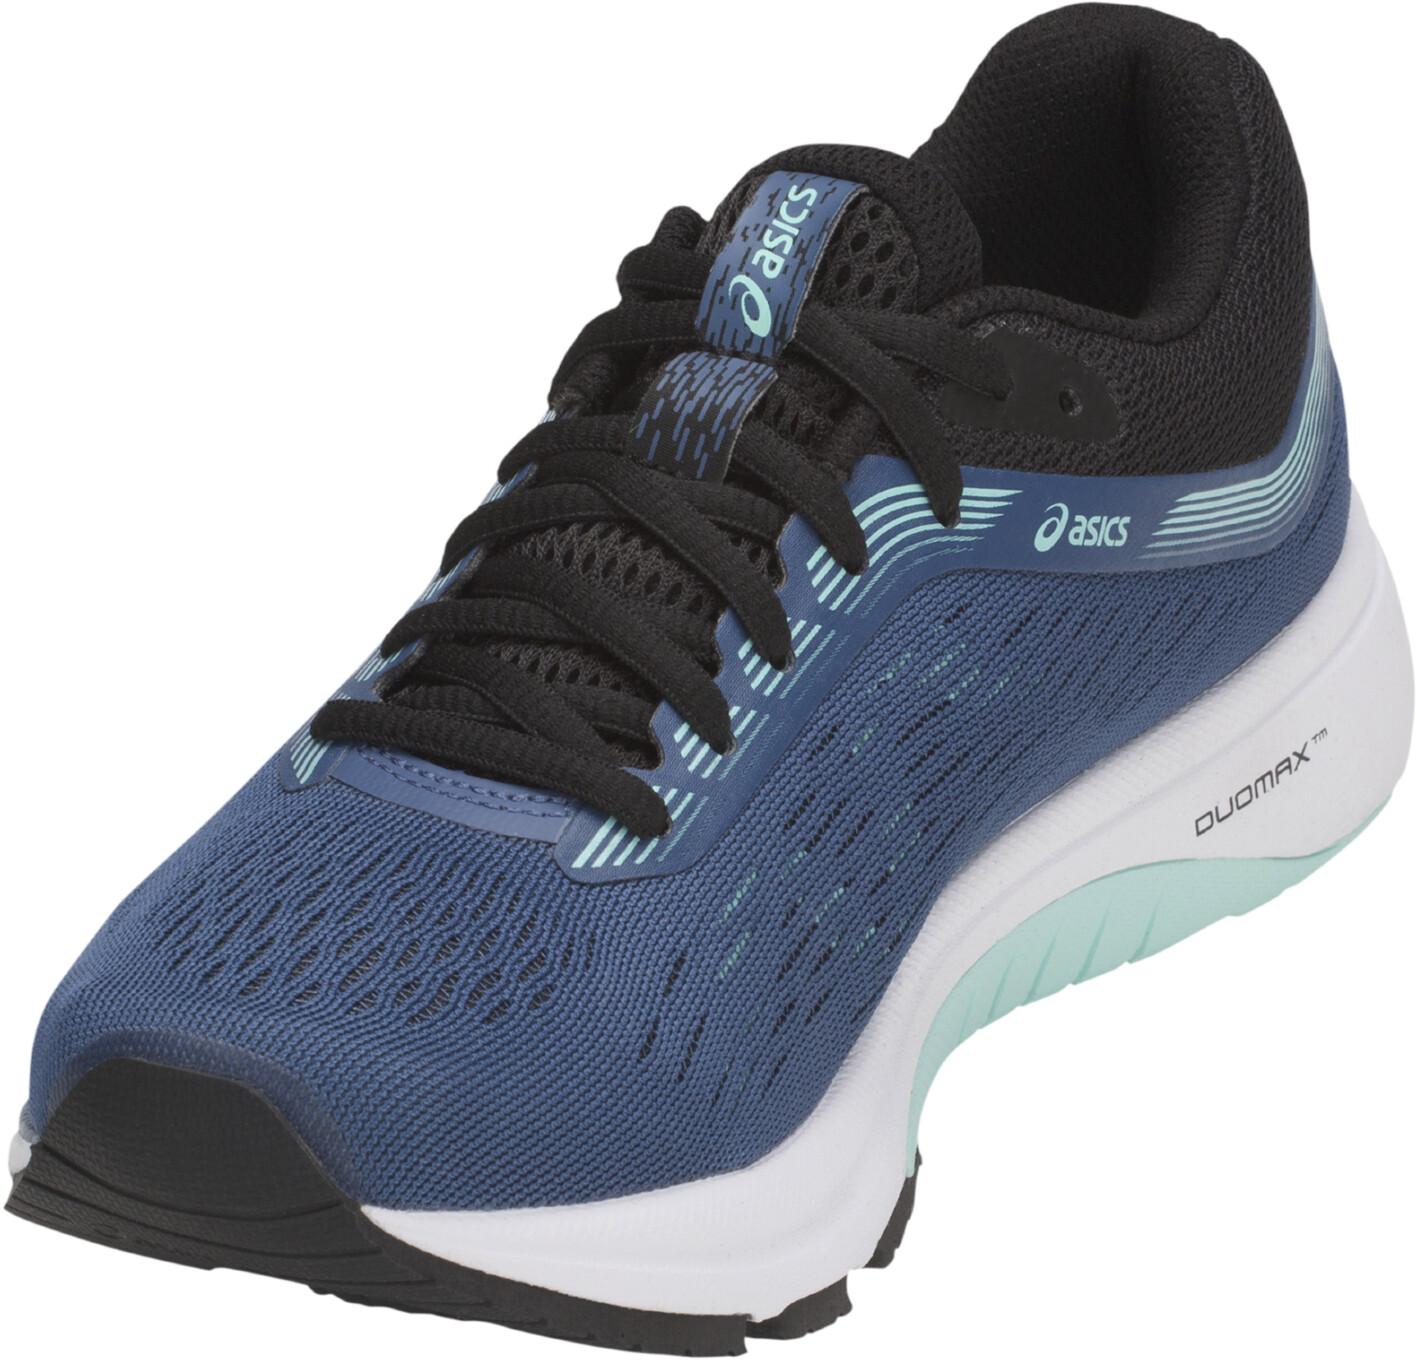 reputable site 577a0 46104 asics GT-1000 7 Shoes Women Grand Shark Black.jpg